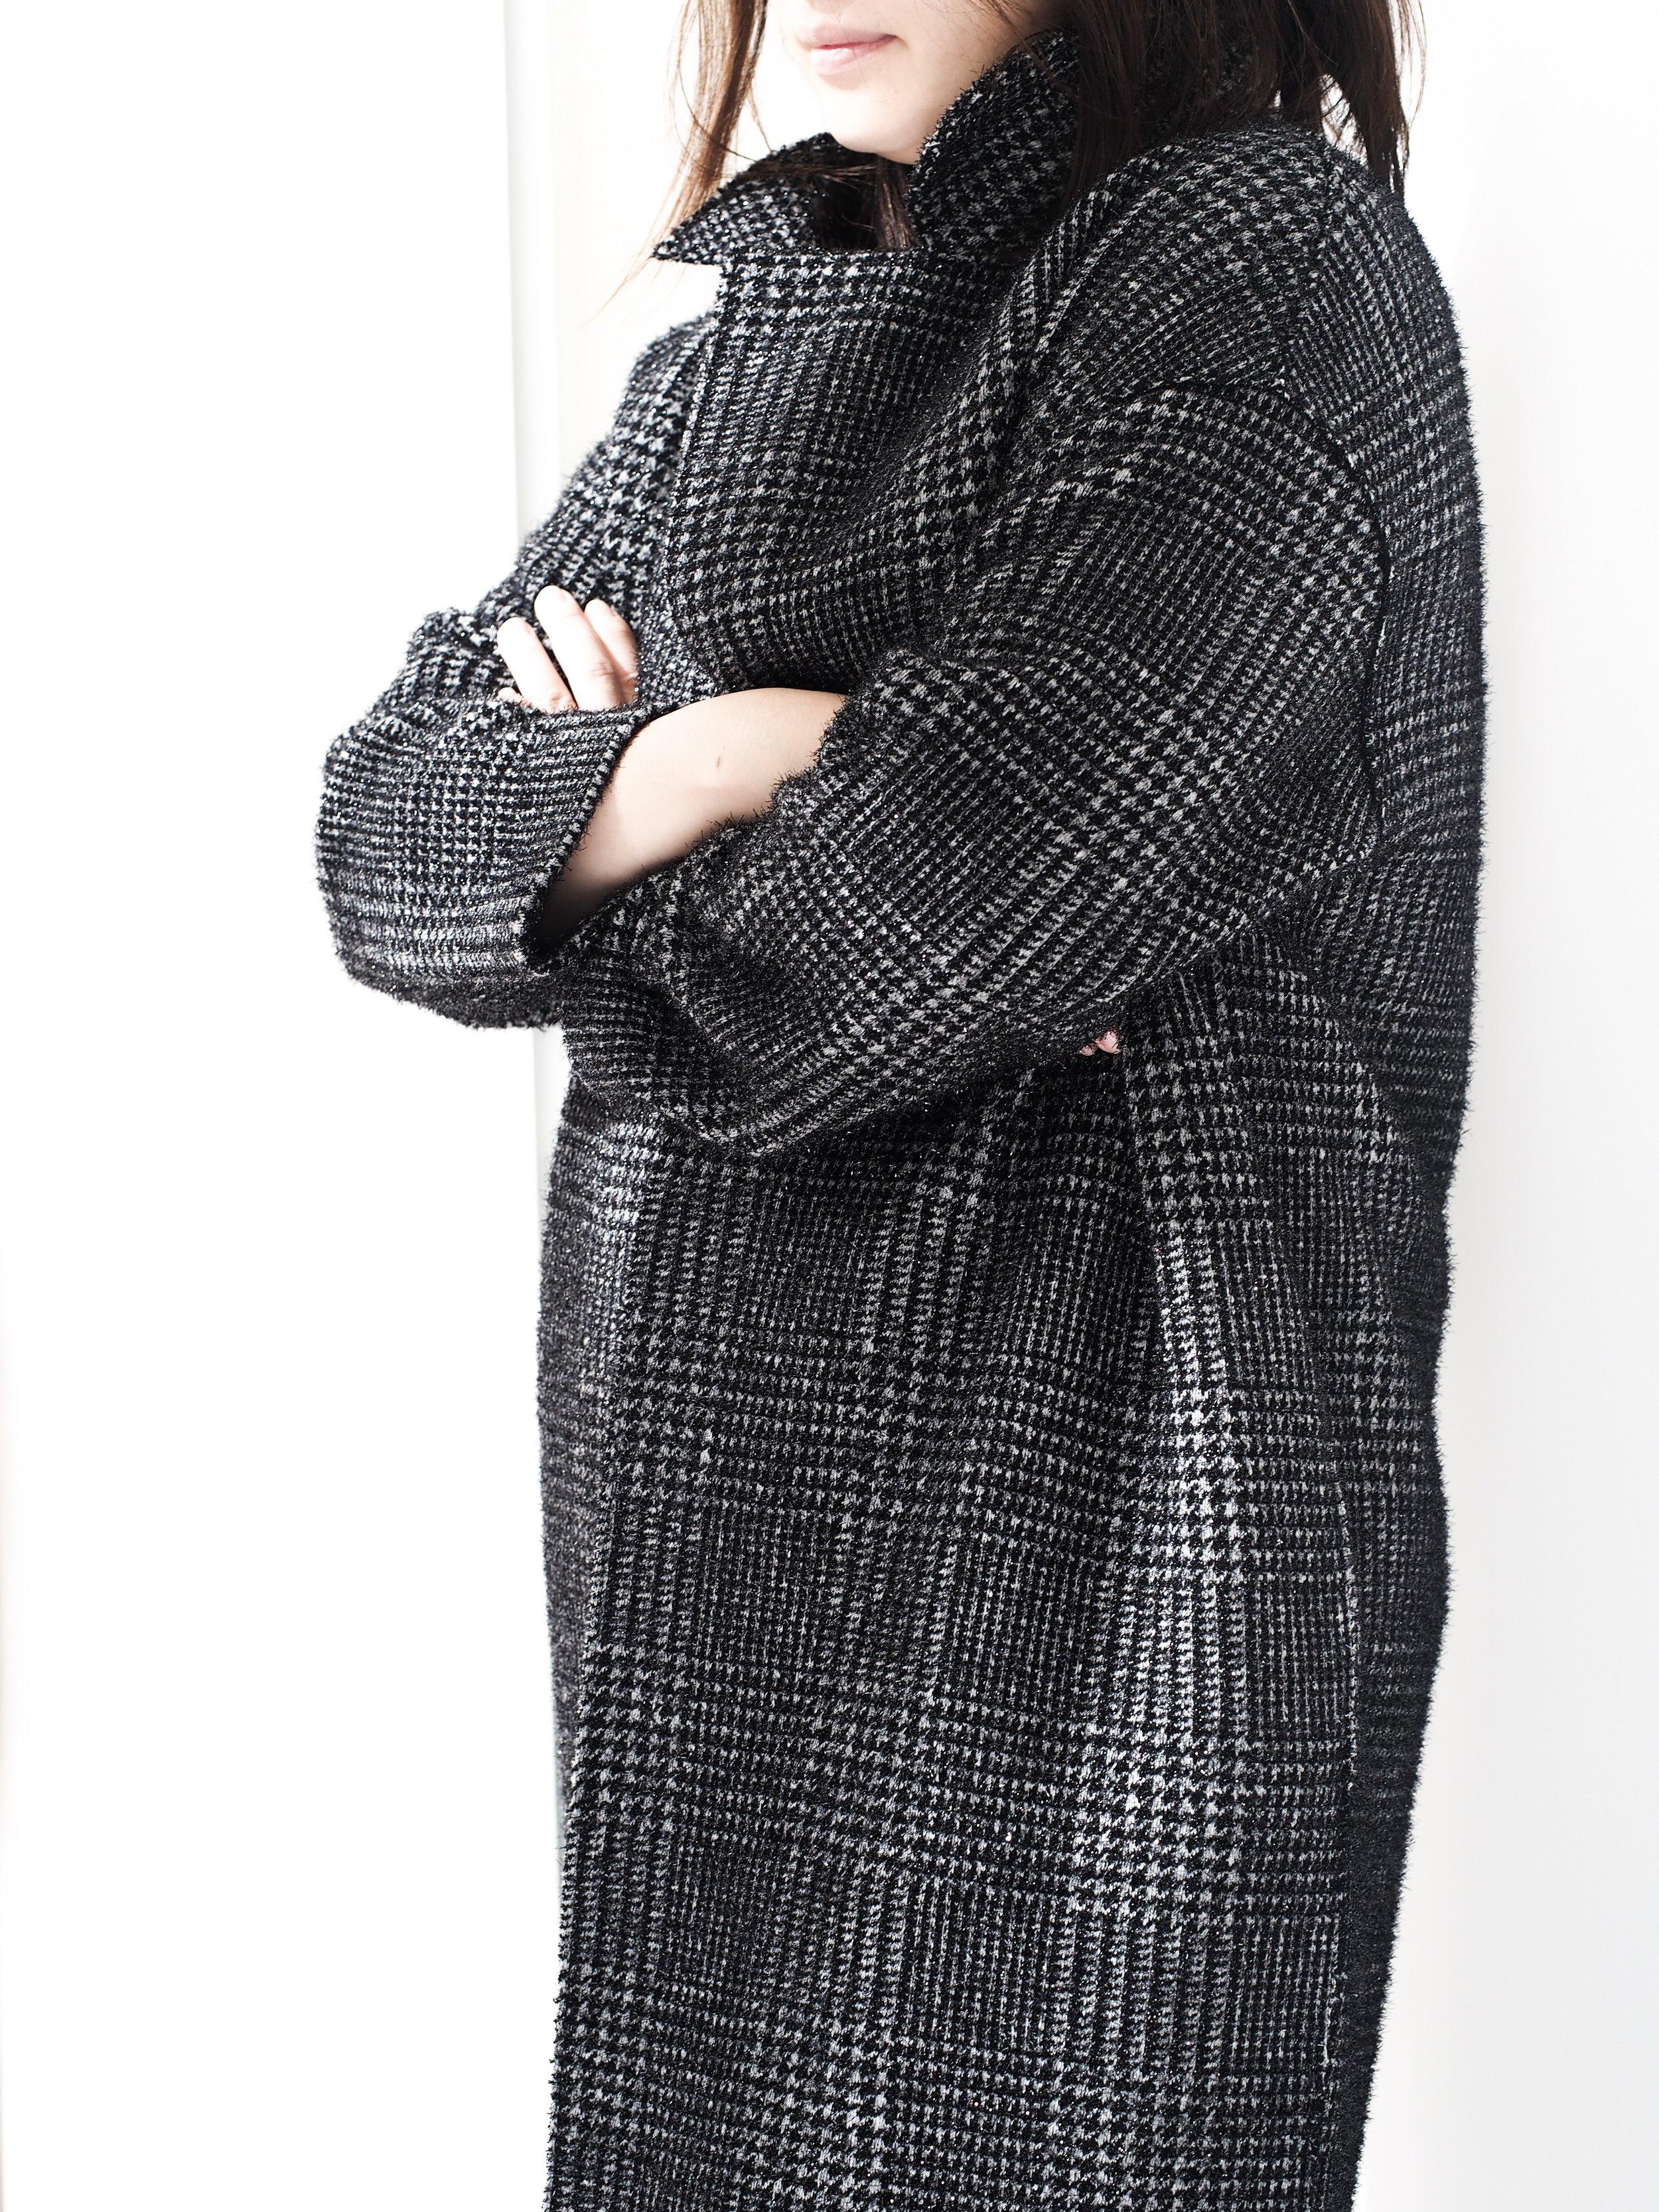 Harris Wharf overcoat.